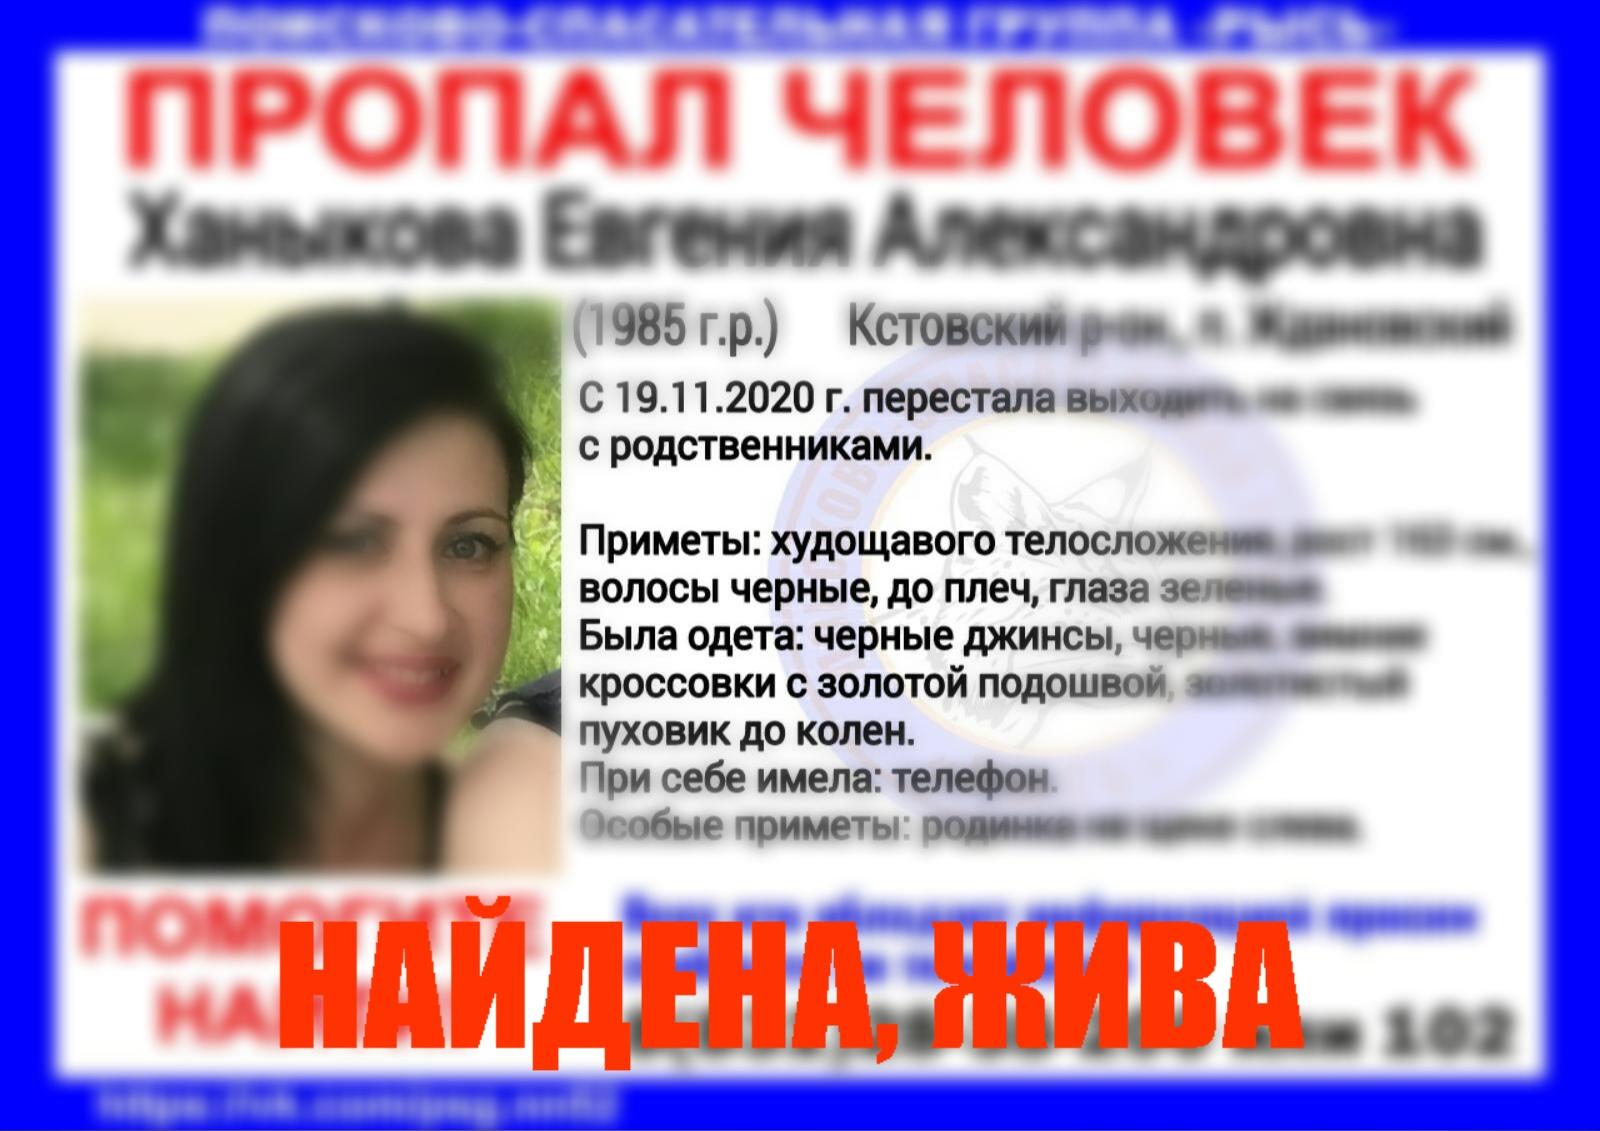 Ханыкова Евгения Александровна